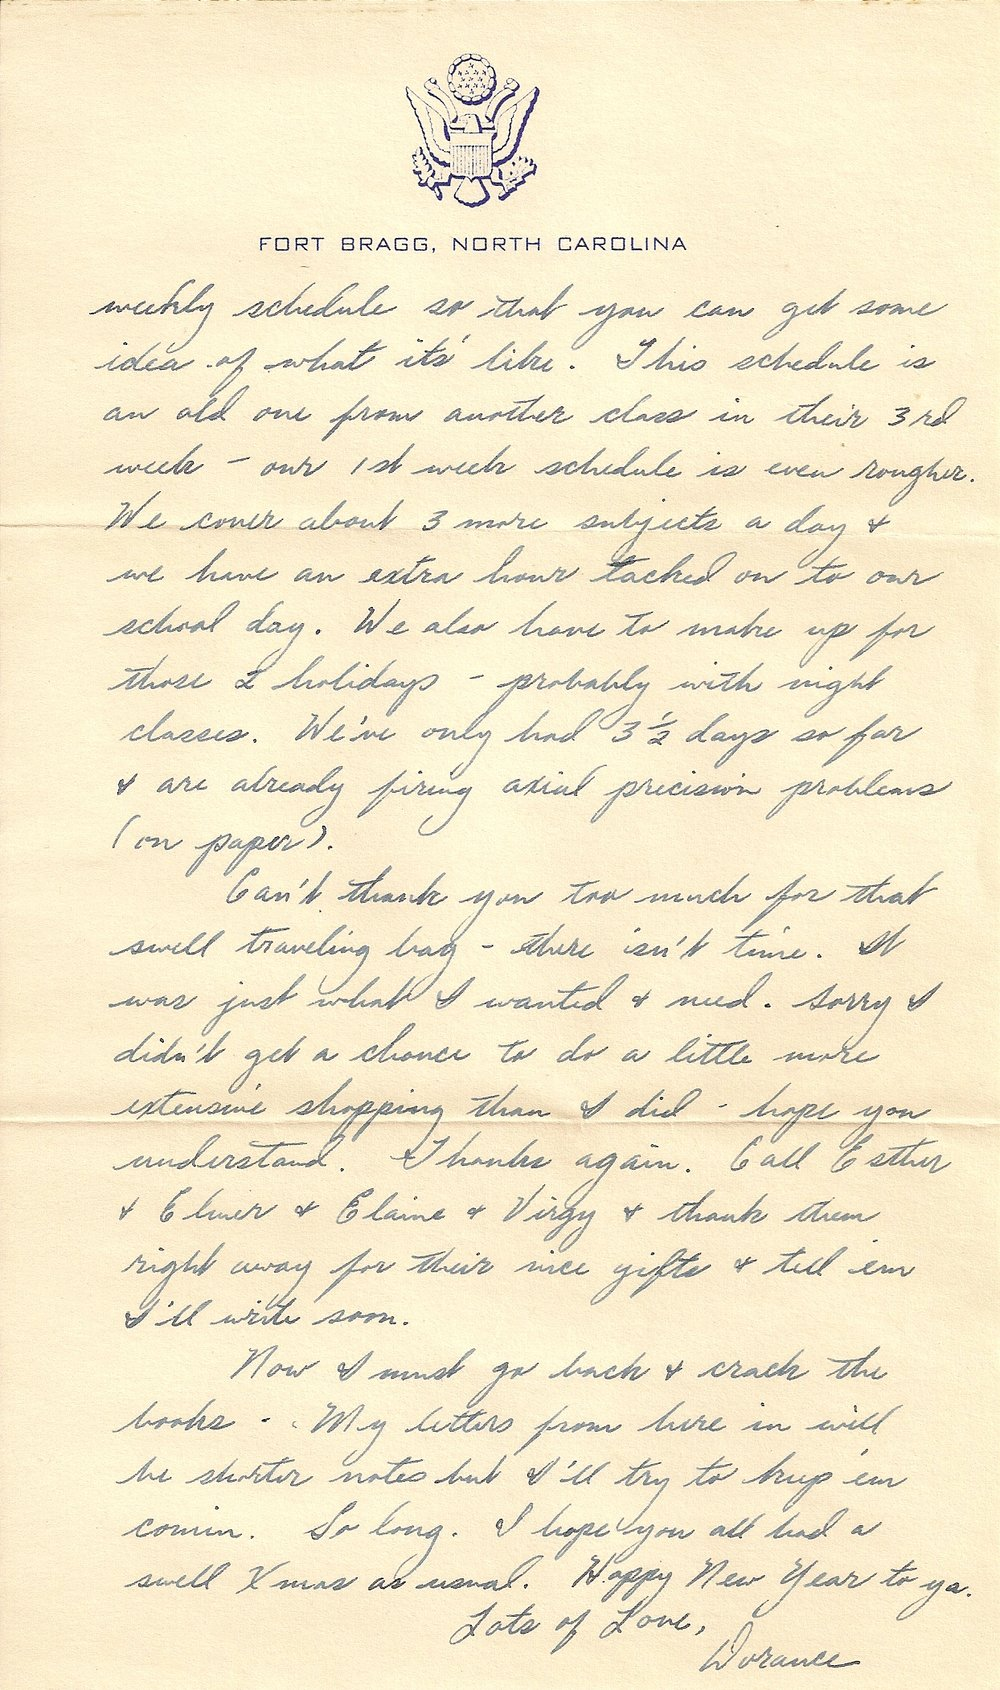 12.27.1942c.jpg